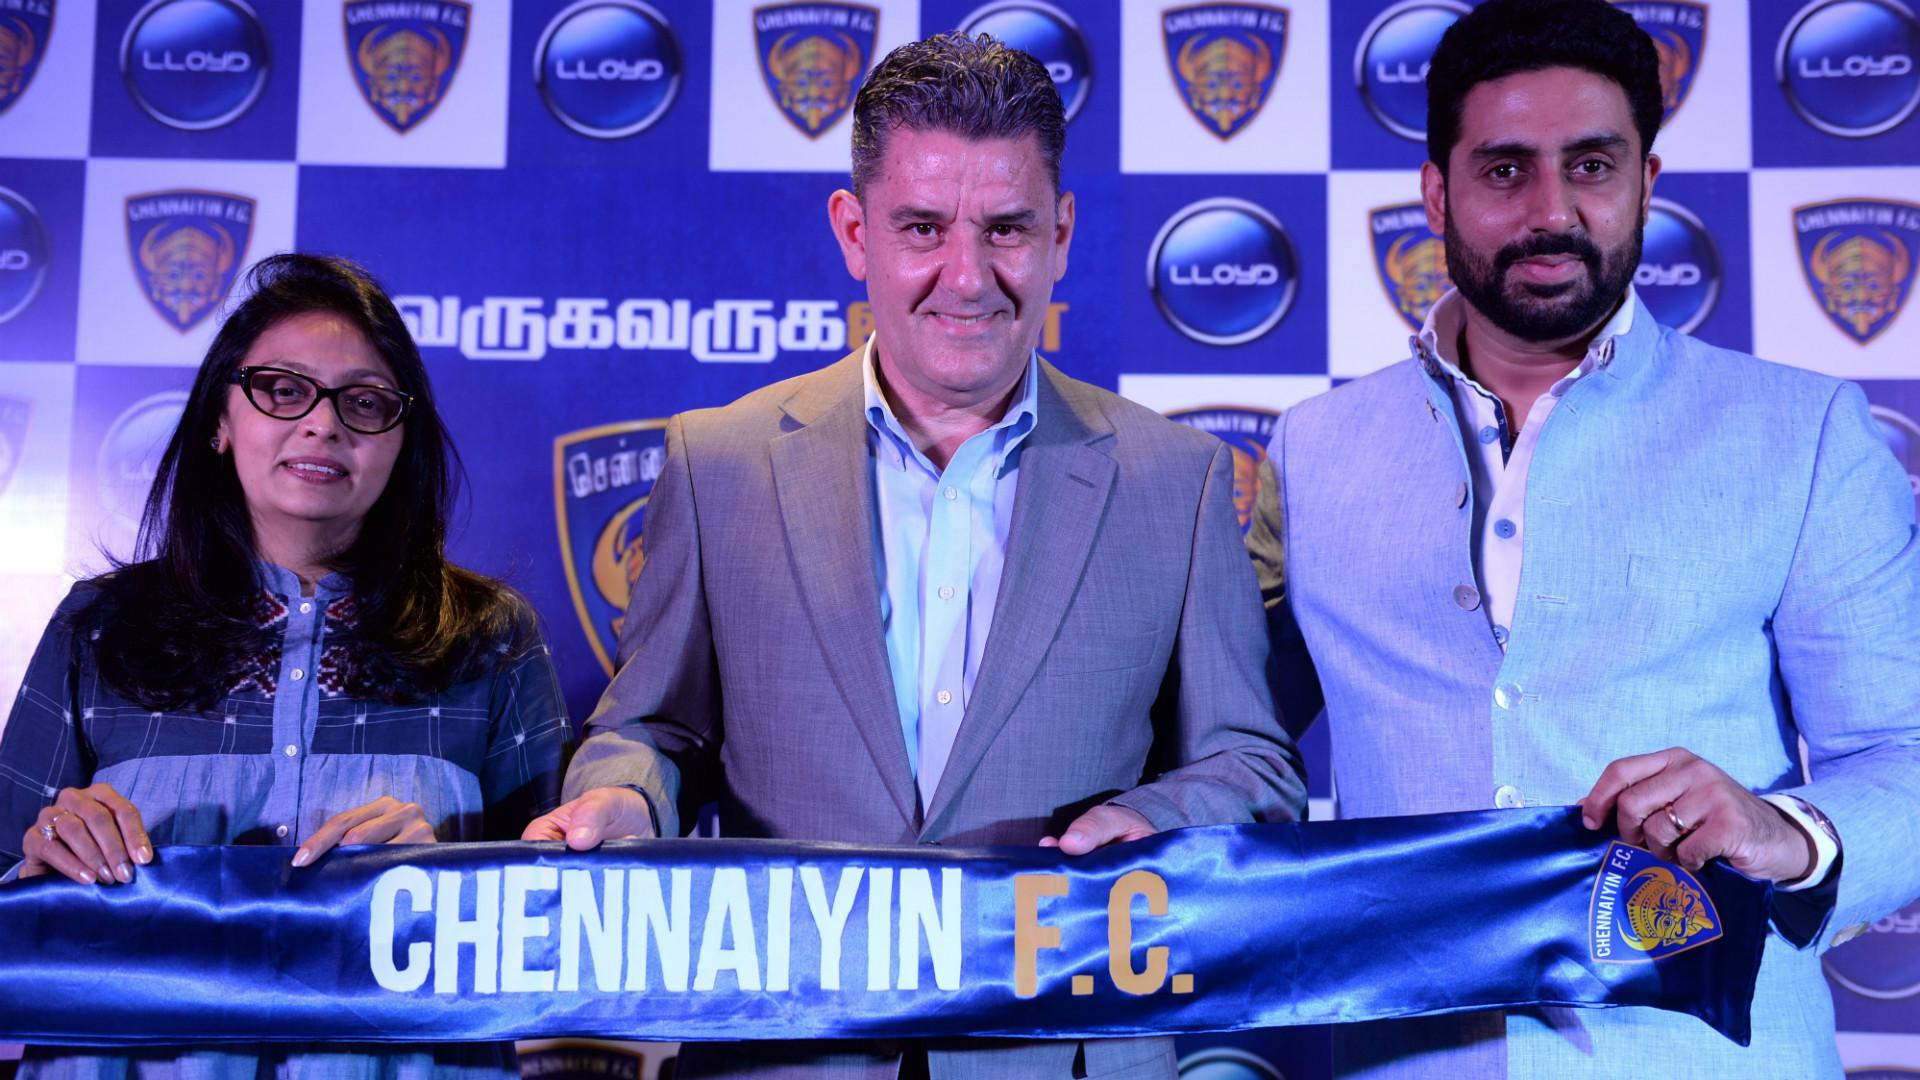 Vinita Dani John Gregory Abhishek Bachchan Chennaiyin FC ISL 4